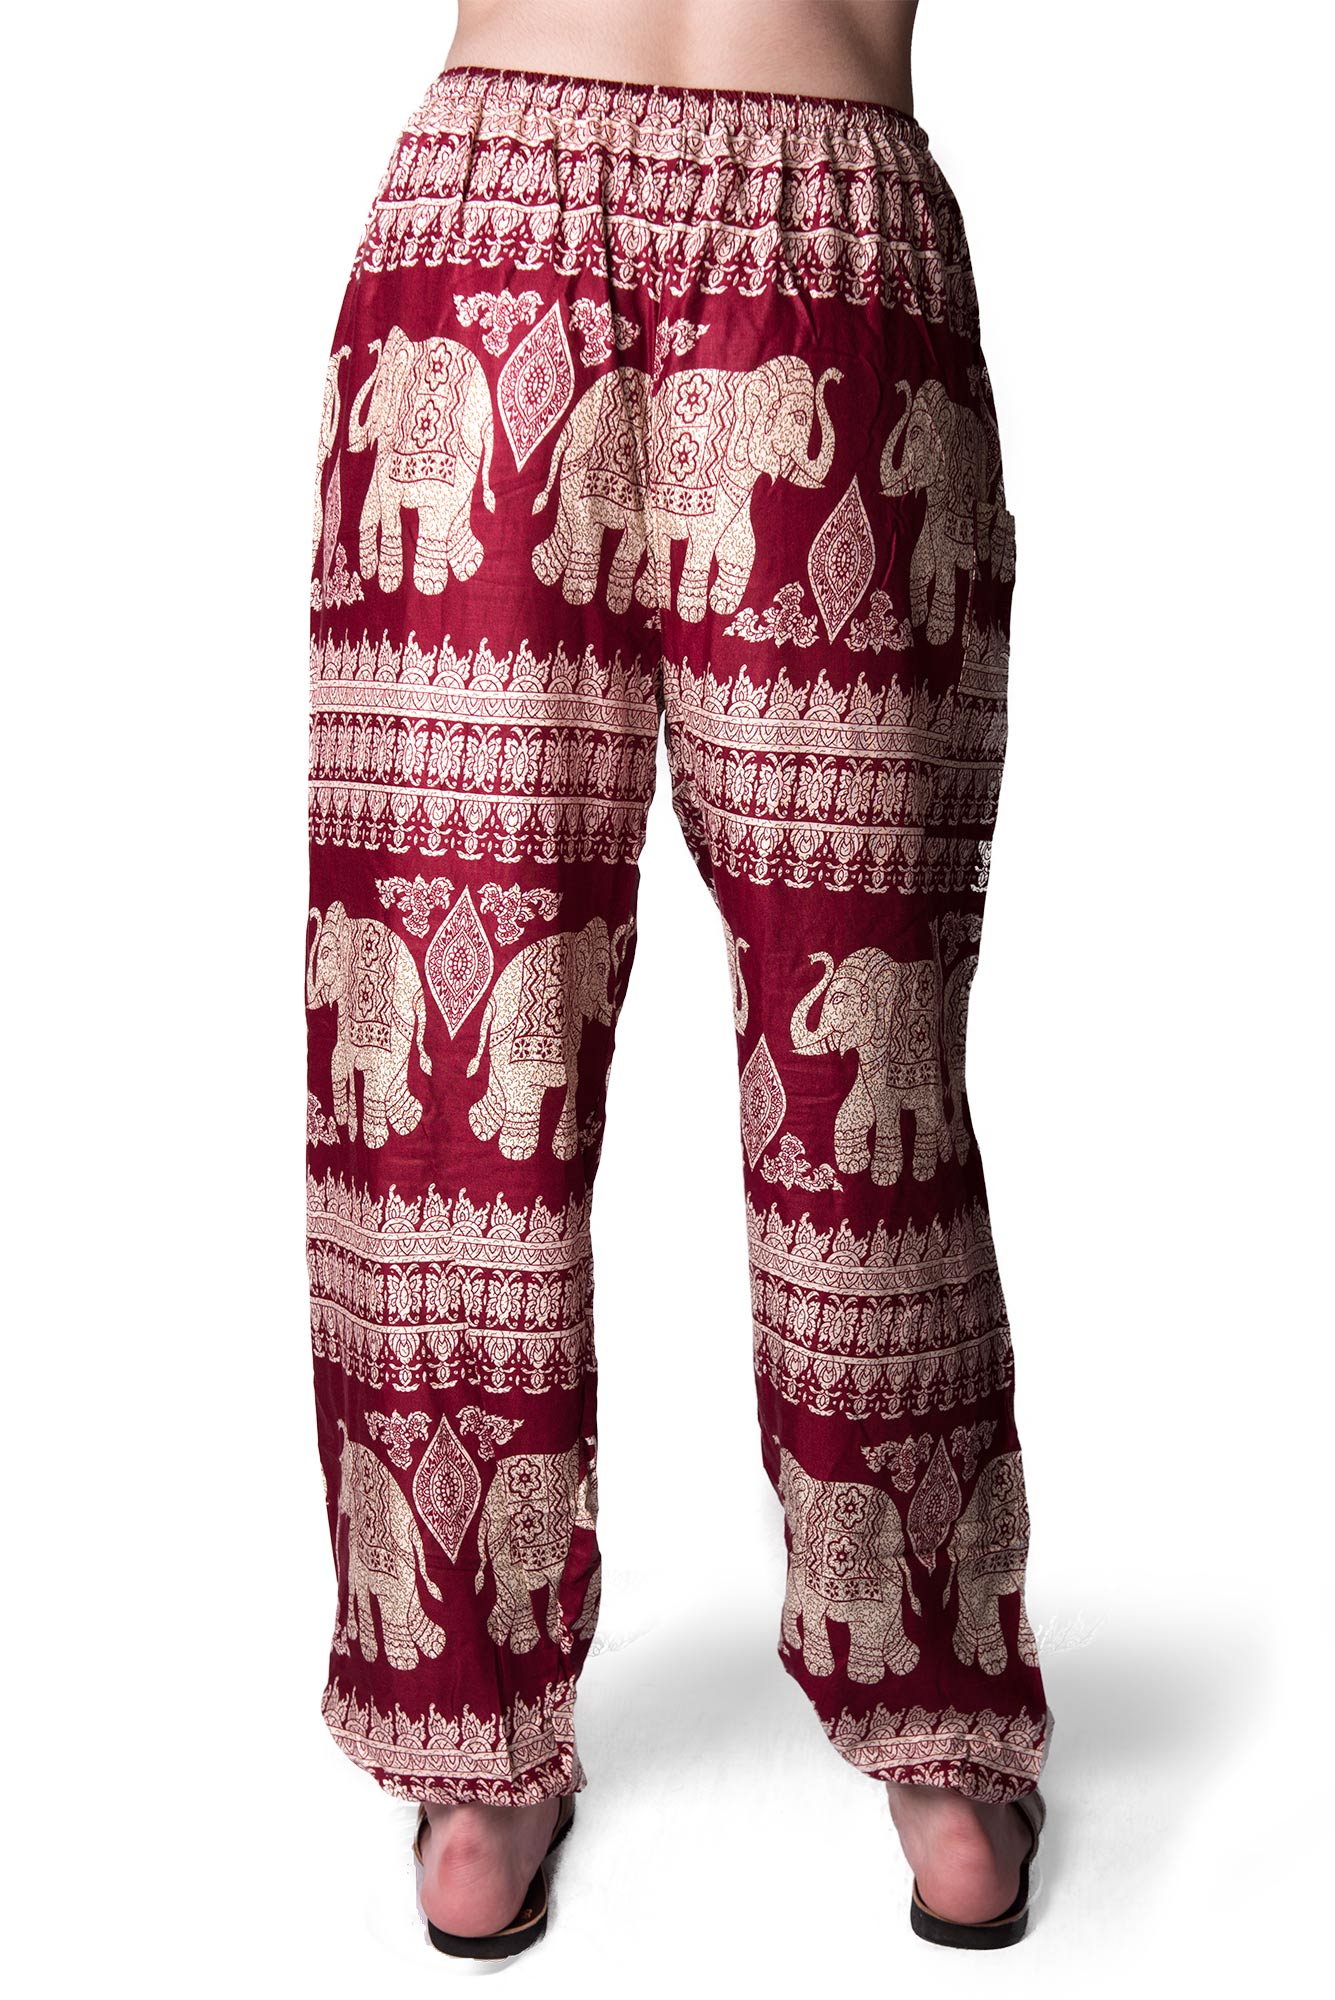 Drawstring Pants Elephant Print Red  - 4495R